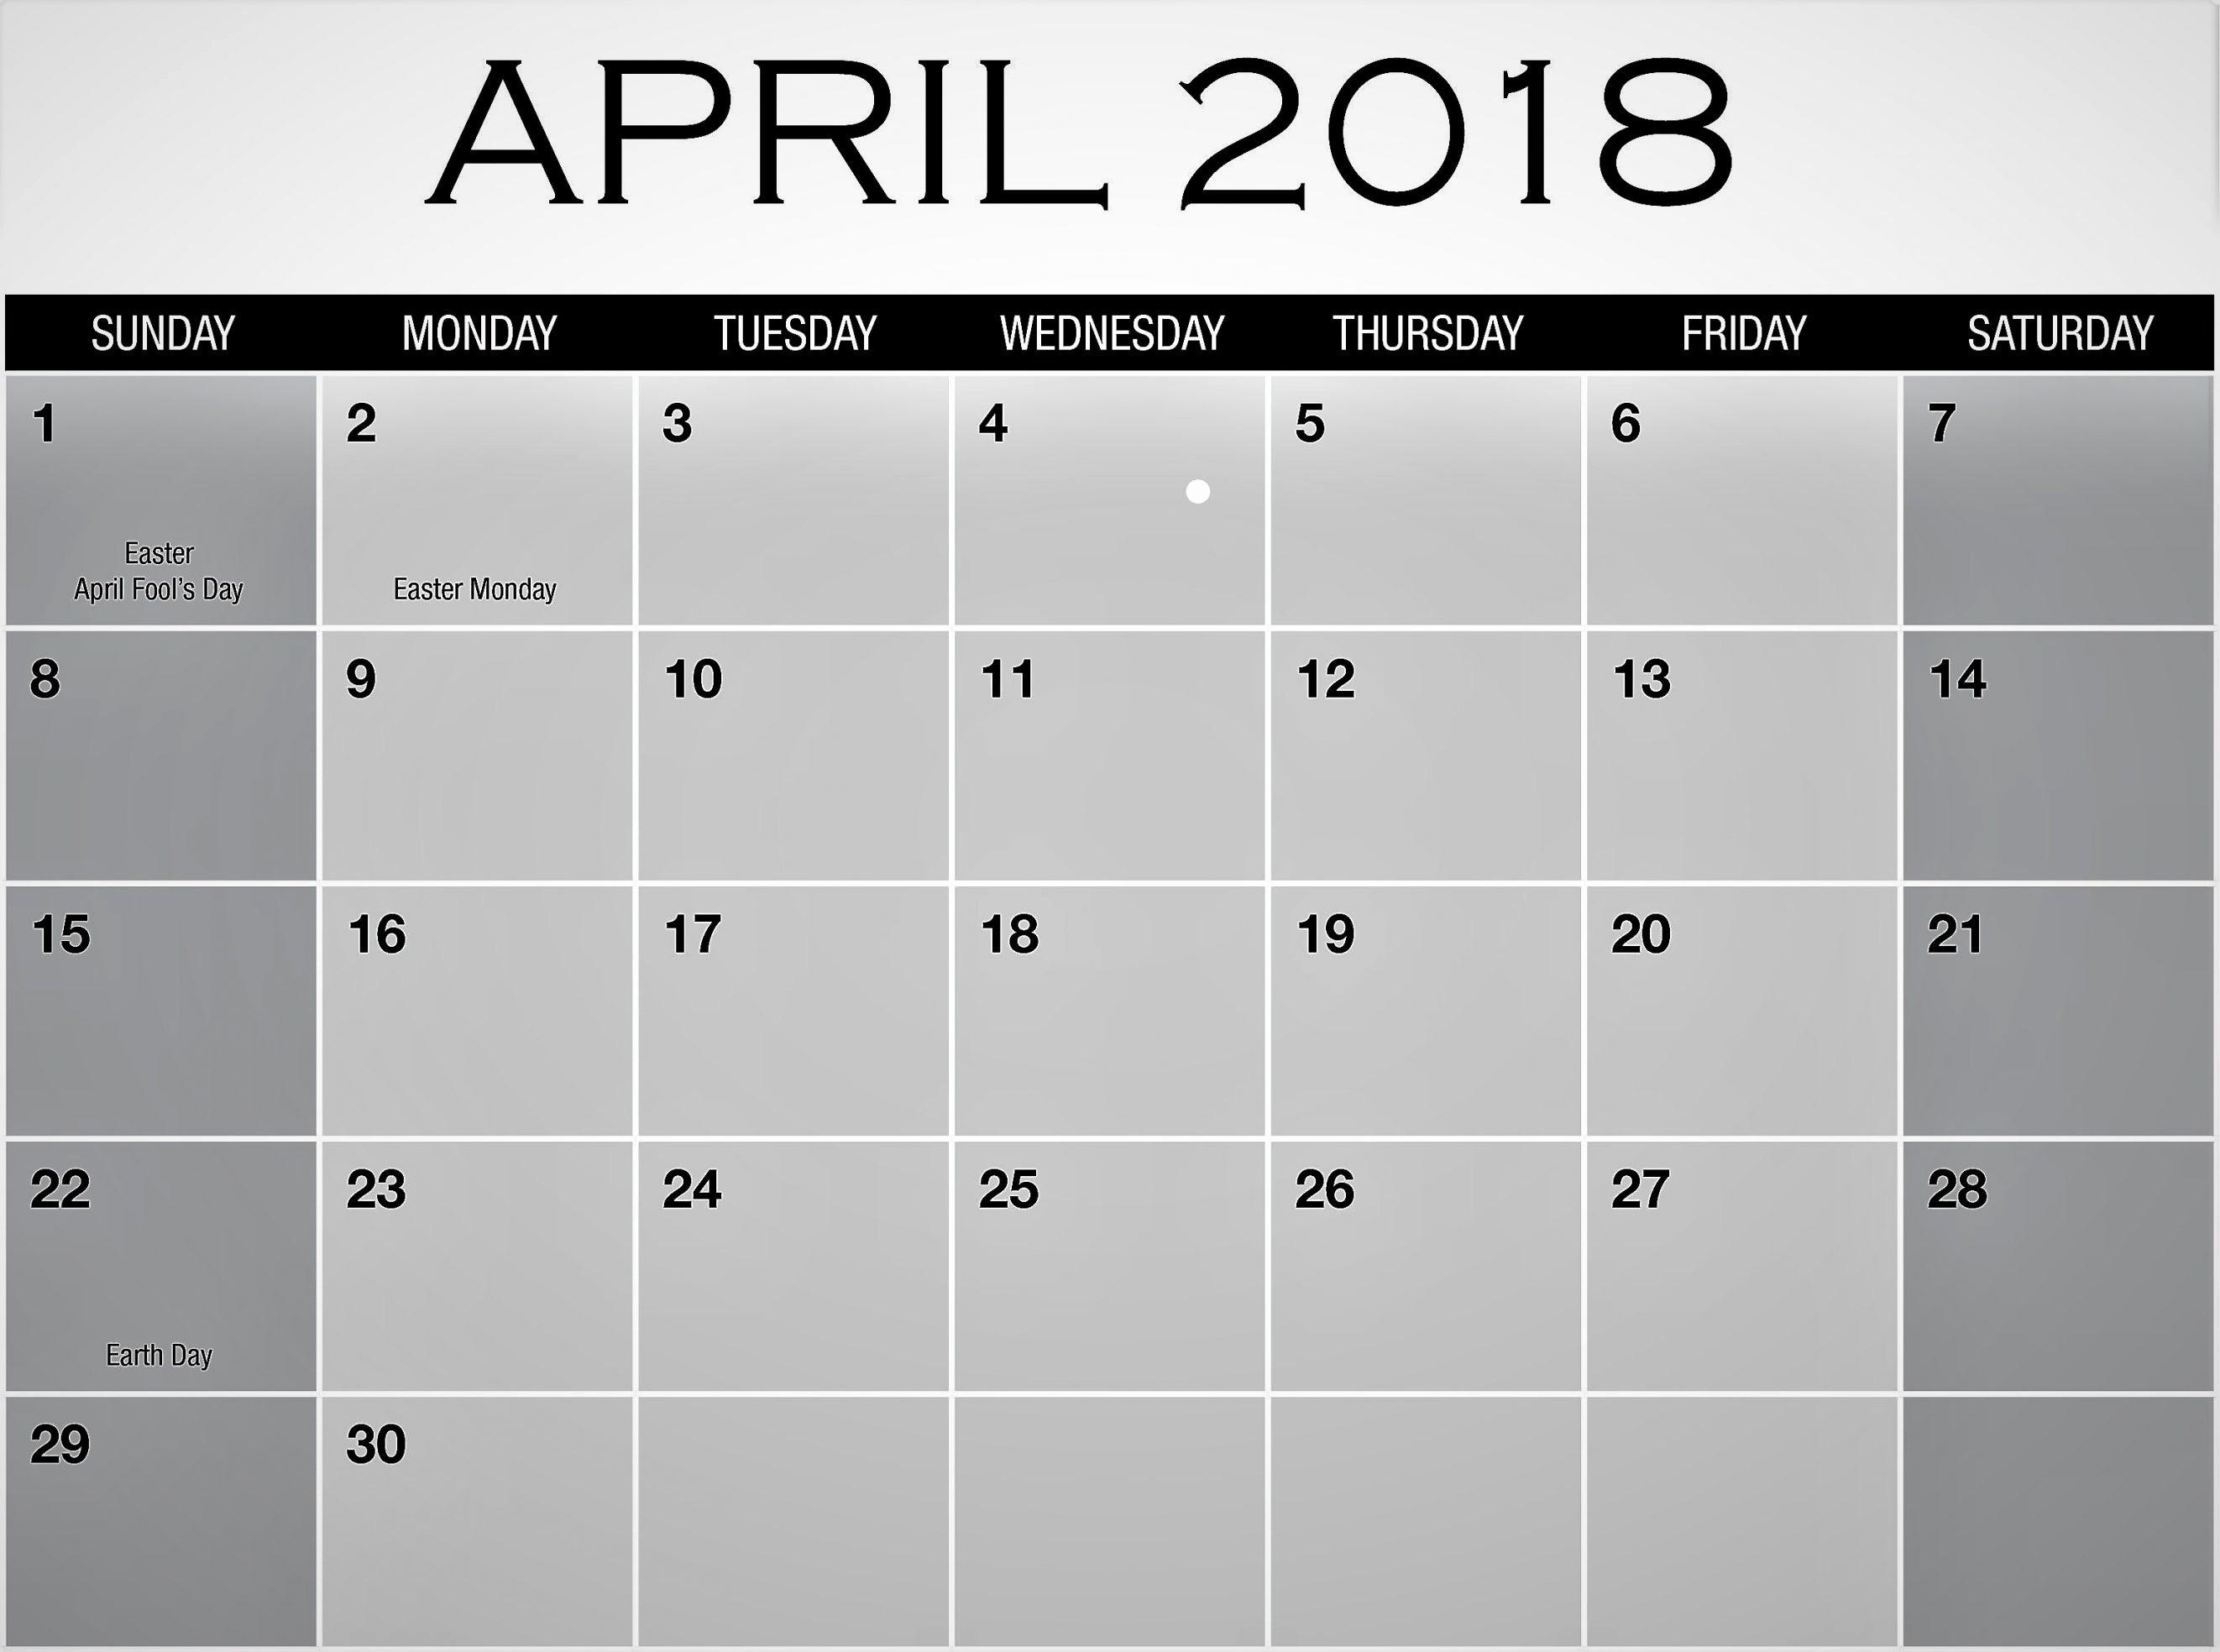 Calendar 2018 Printable with Holidays Fresh April 2018 Calendar with Holidays Printable